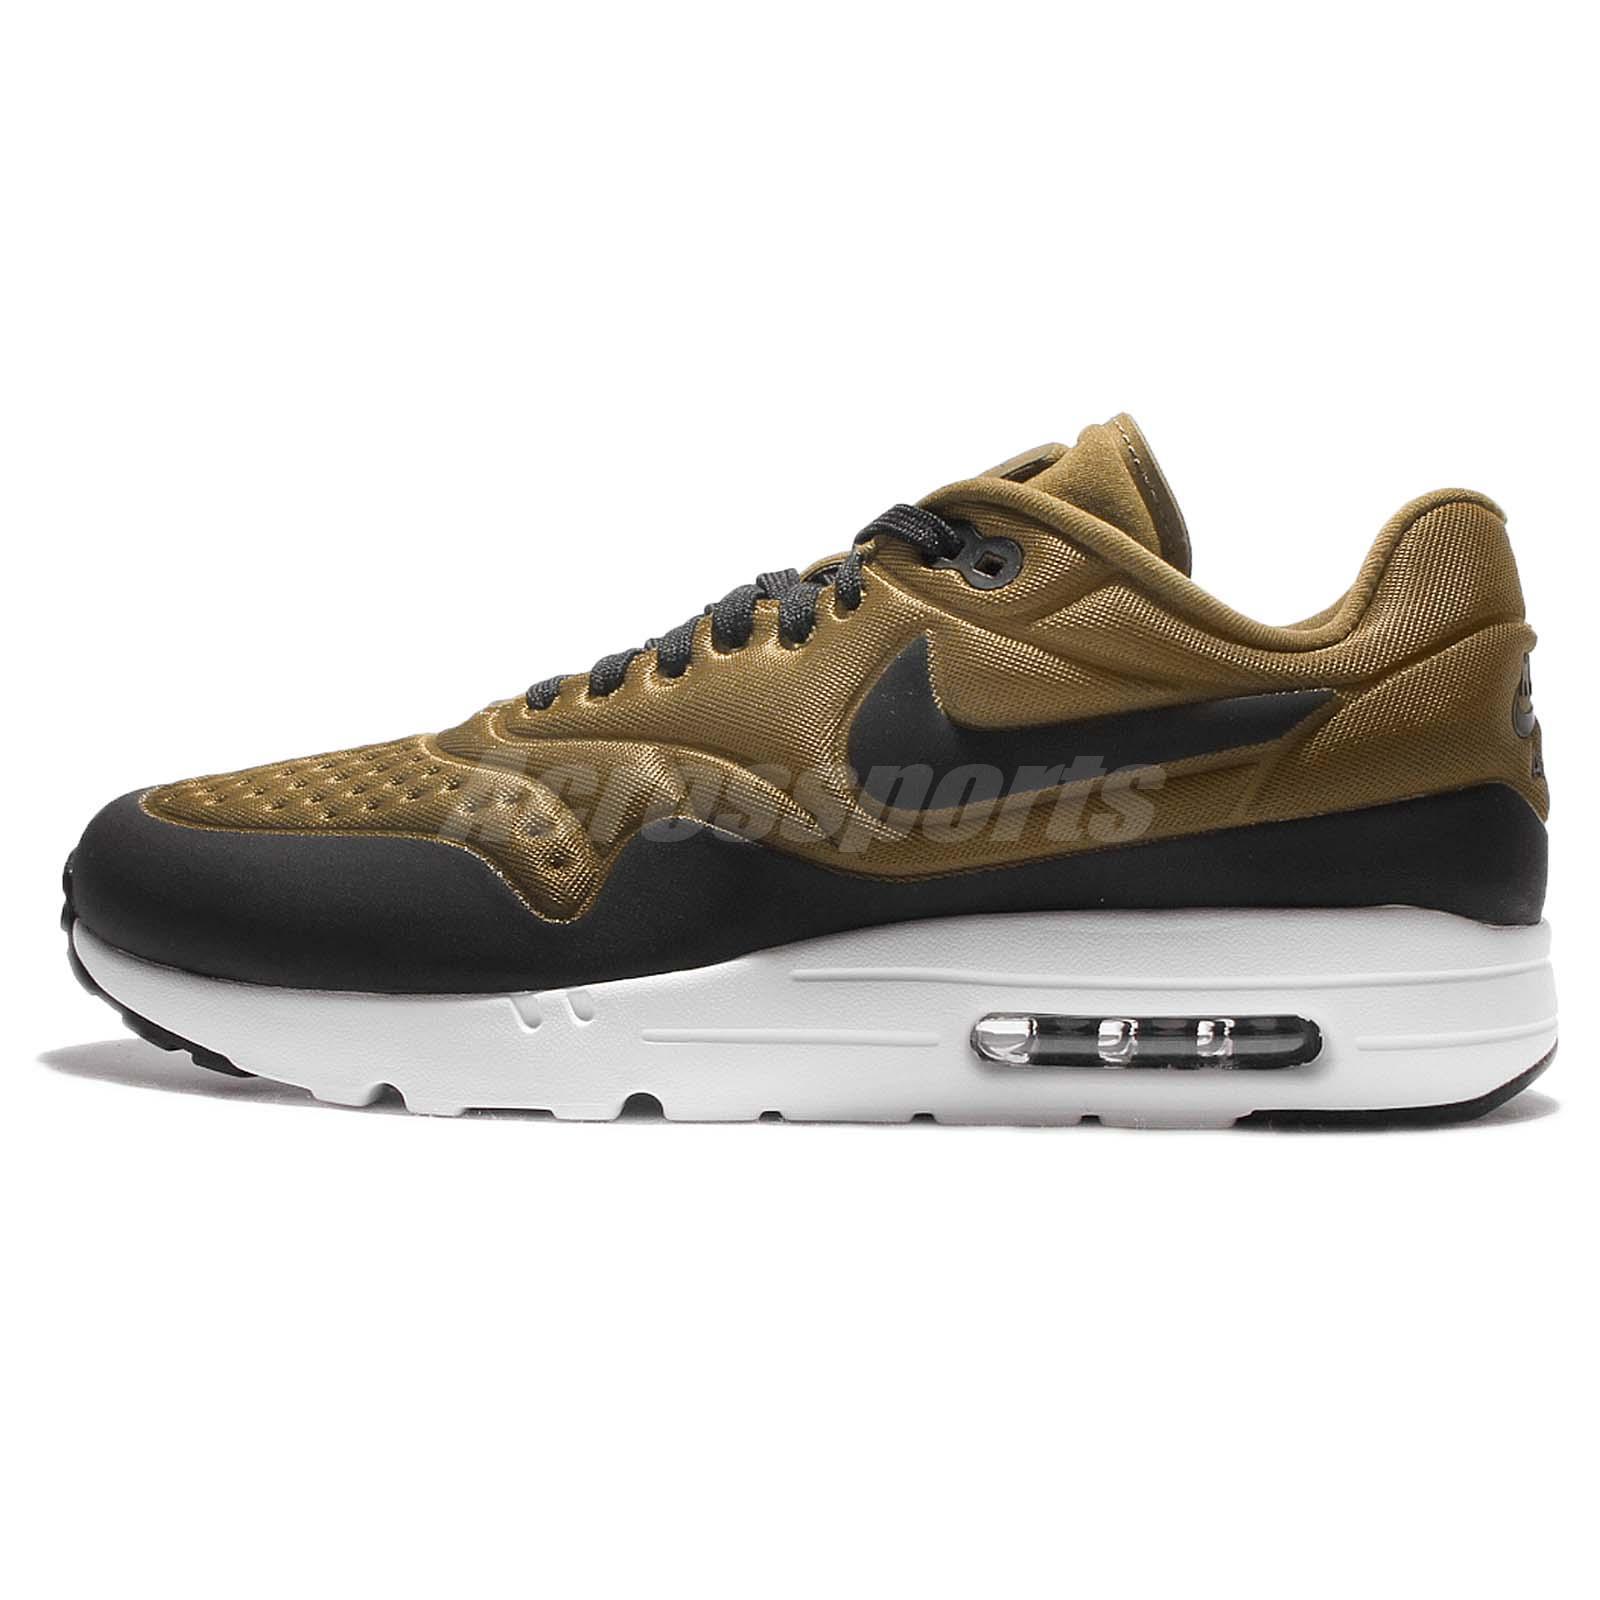 big sale 4e505 6e6e9 ... new arrivals nike air max 1 ultra se olive flak black mens running shoes  sneakers 845038